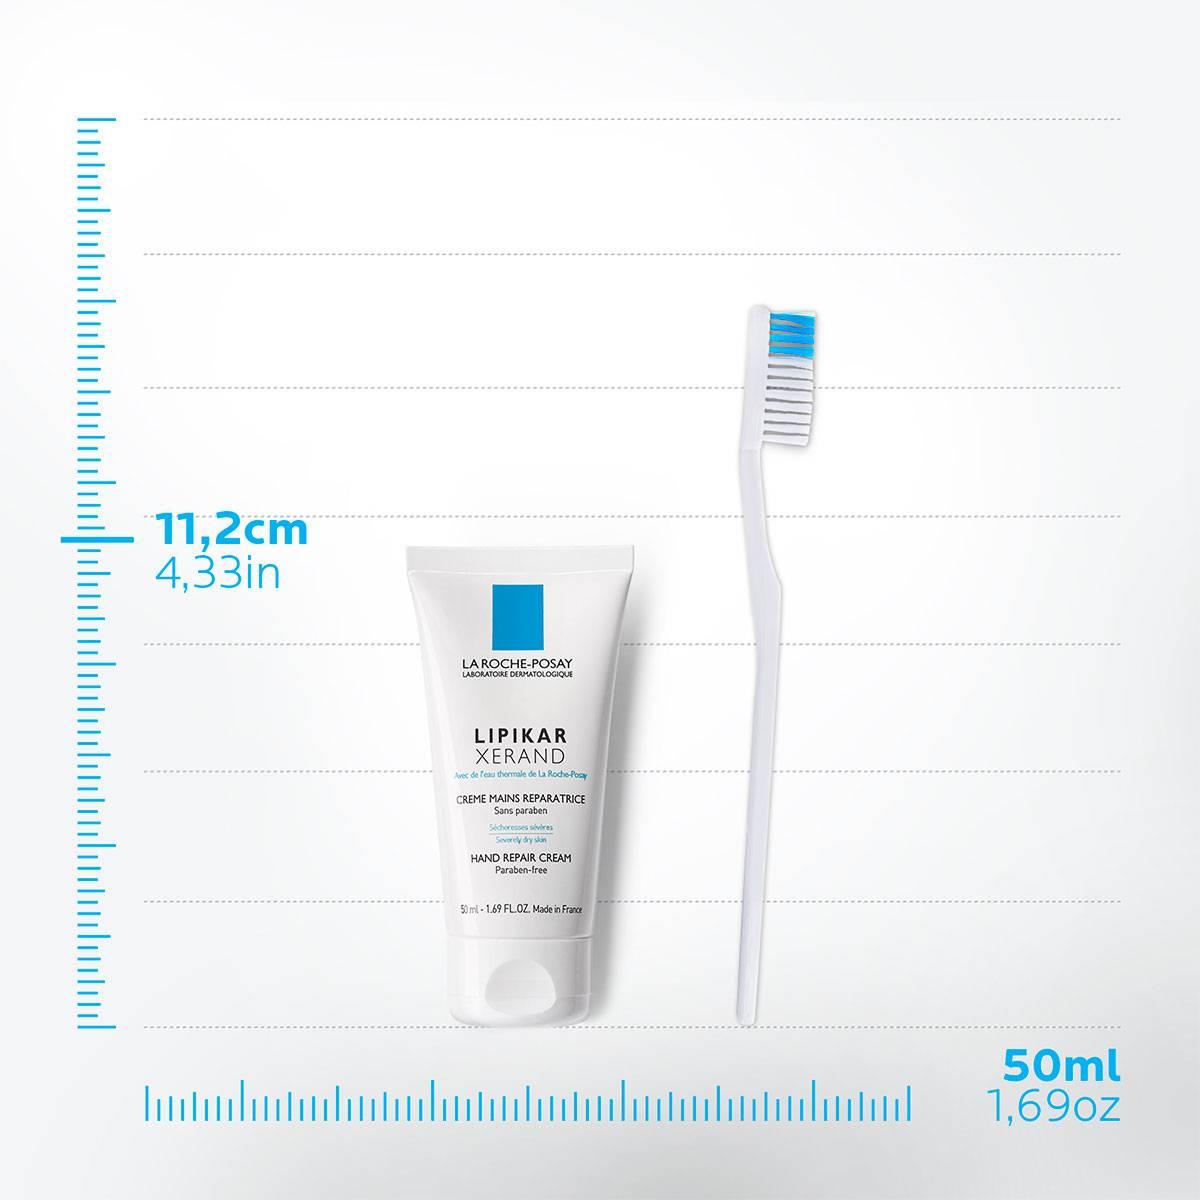 La Roche Posay ProductPage Eczema Lipikar Xerand 50ml 3337872412684